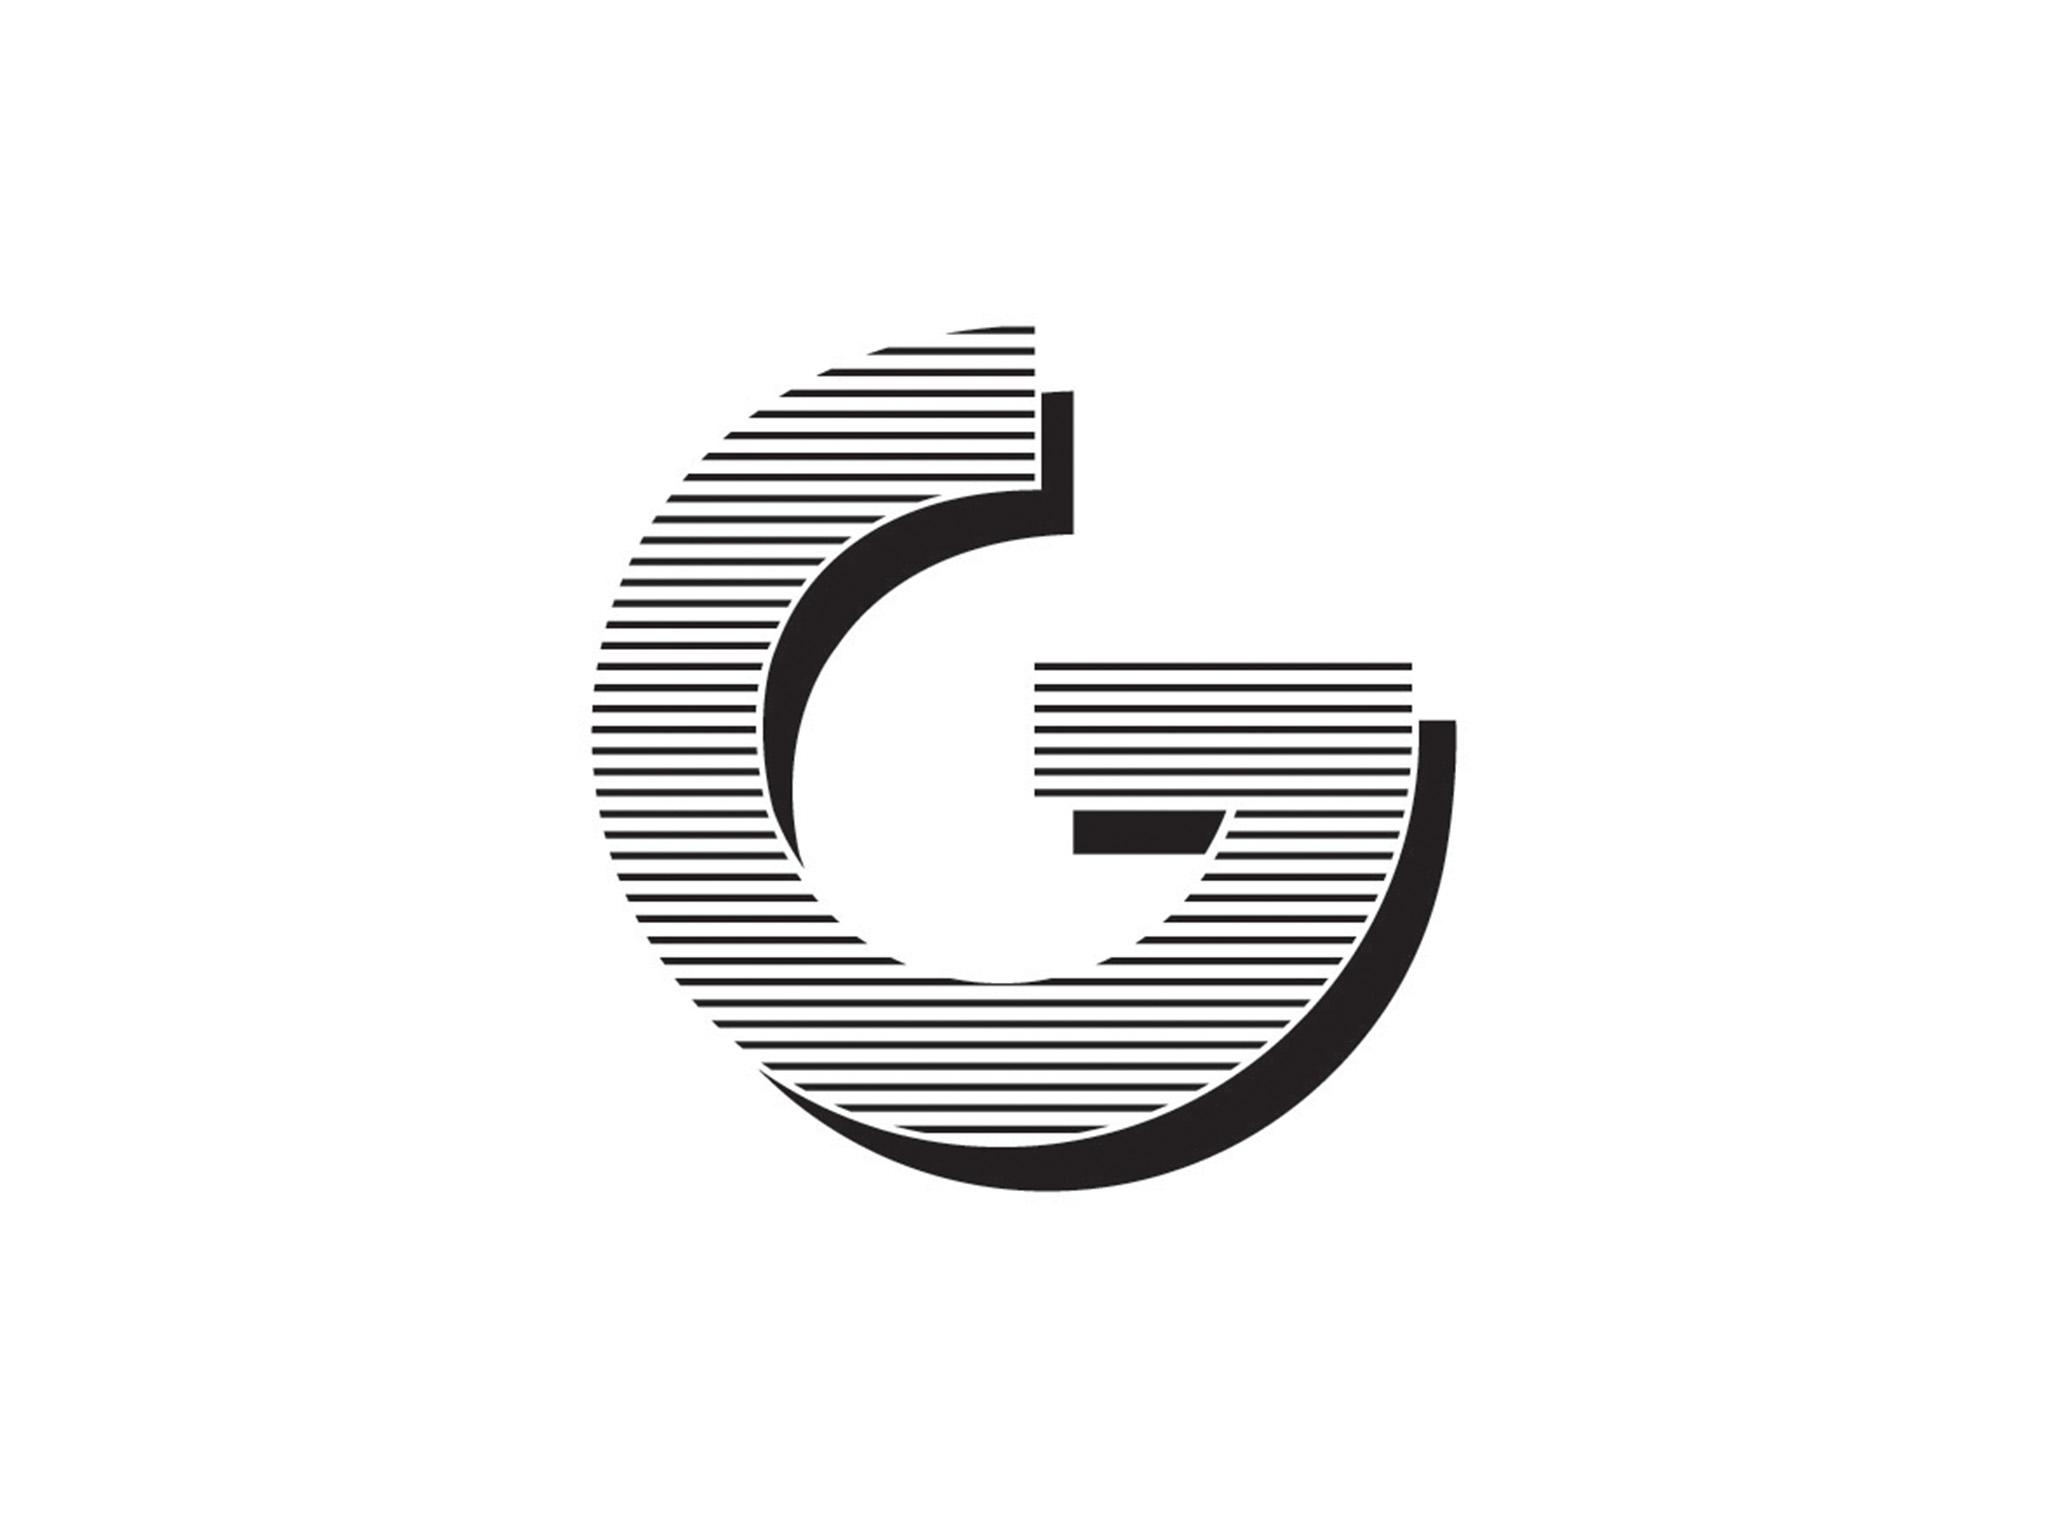 apex_letters_horizontal_large_0015_2_final_alphabet coasters-07.jpg